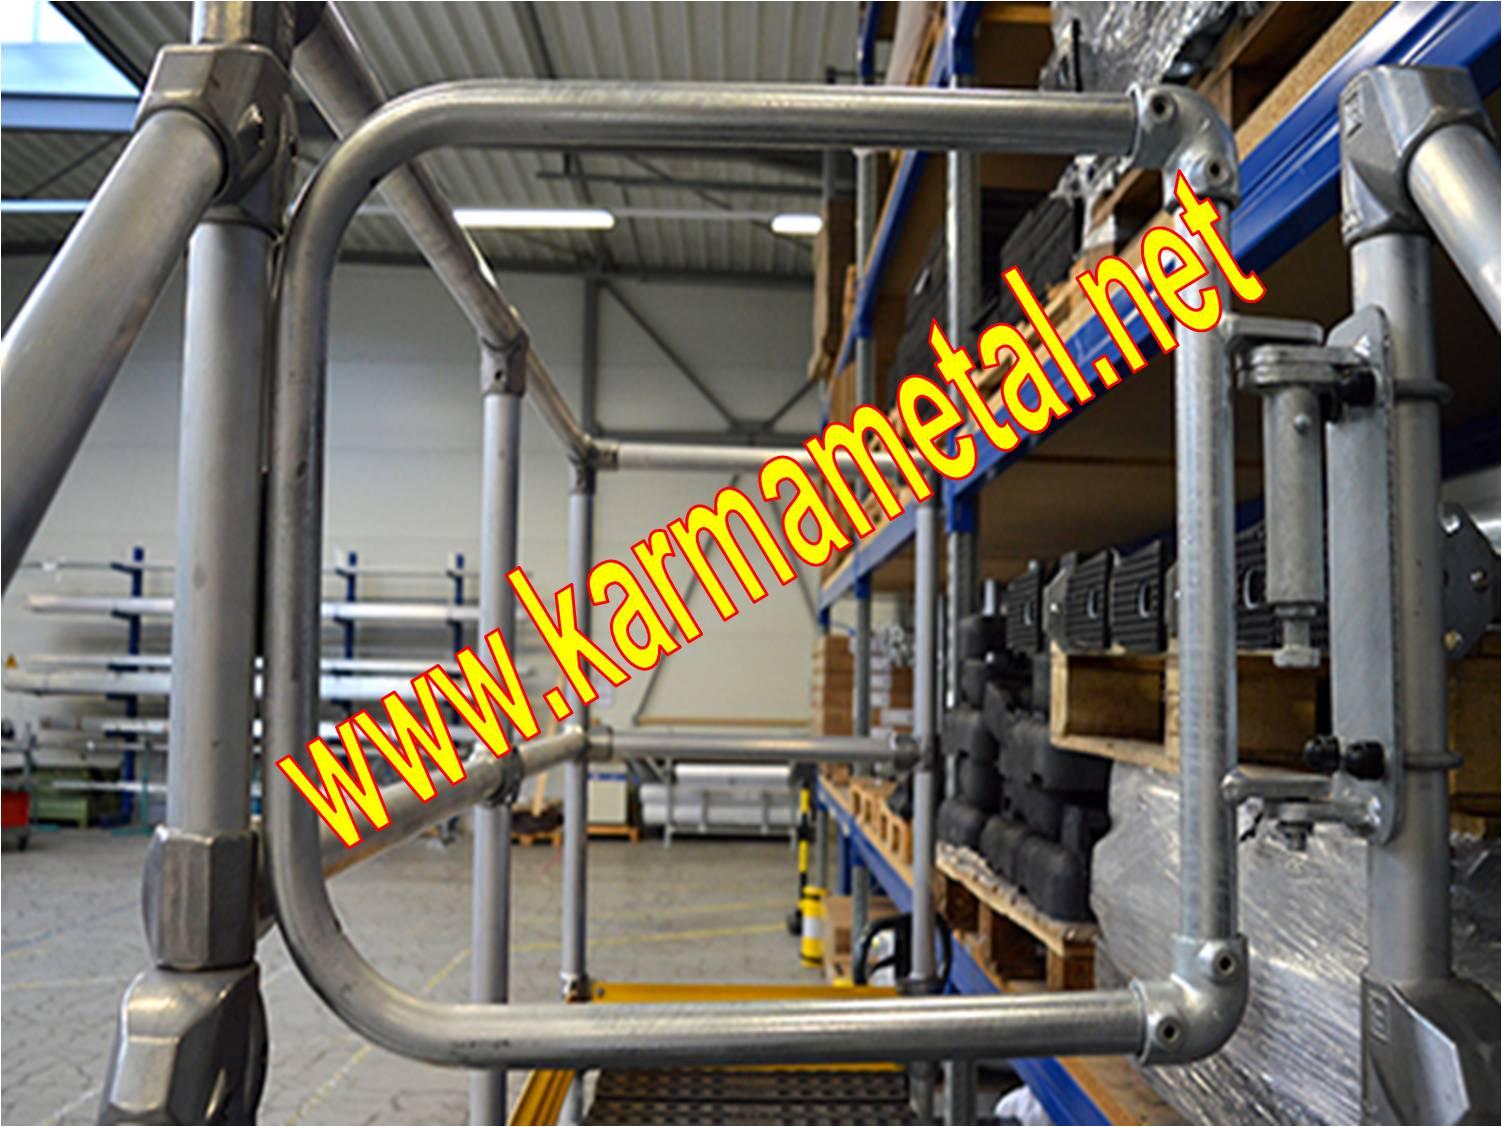 endustriyel-depo-sanayi-yayli-otomatik-kilitli-guvenlik-personel-emniyet-iskele-merdiven-salincak-kapisi-fiyati-modelleri